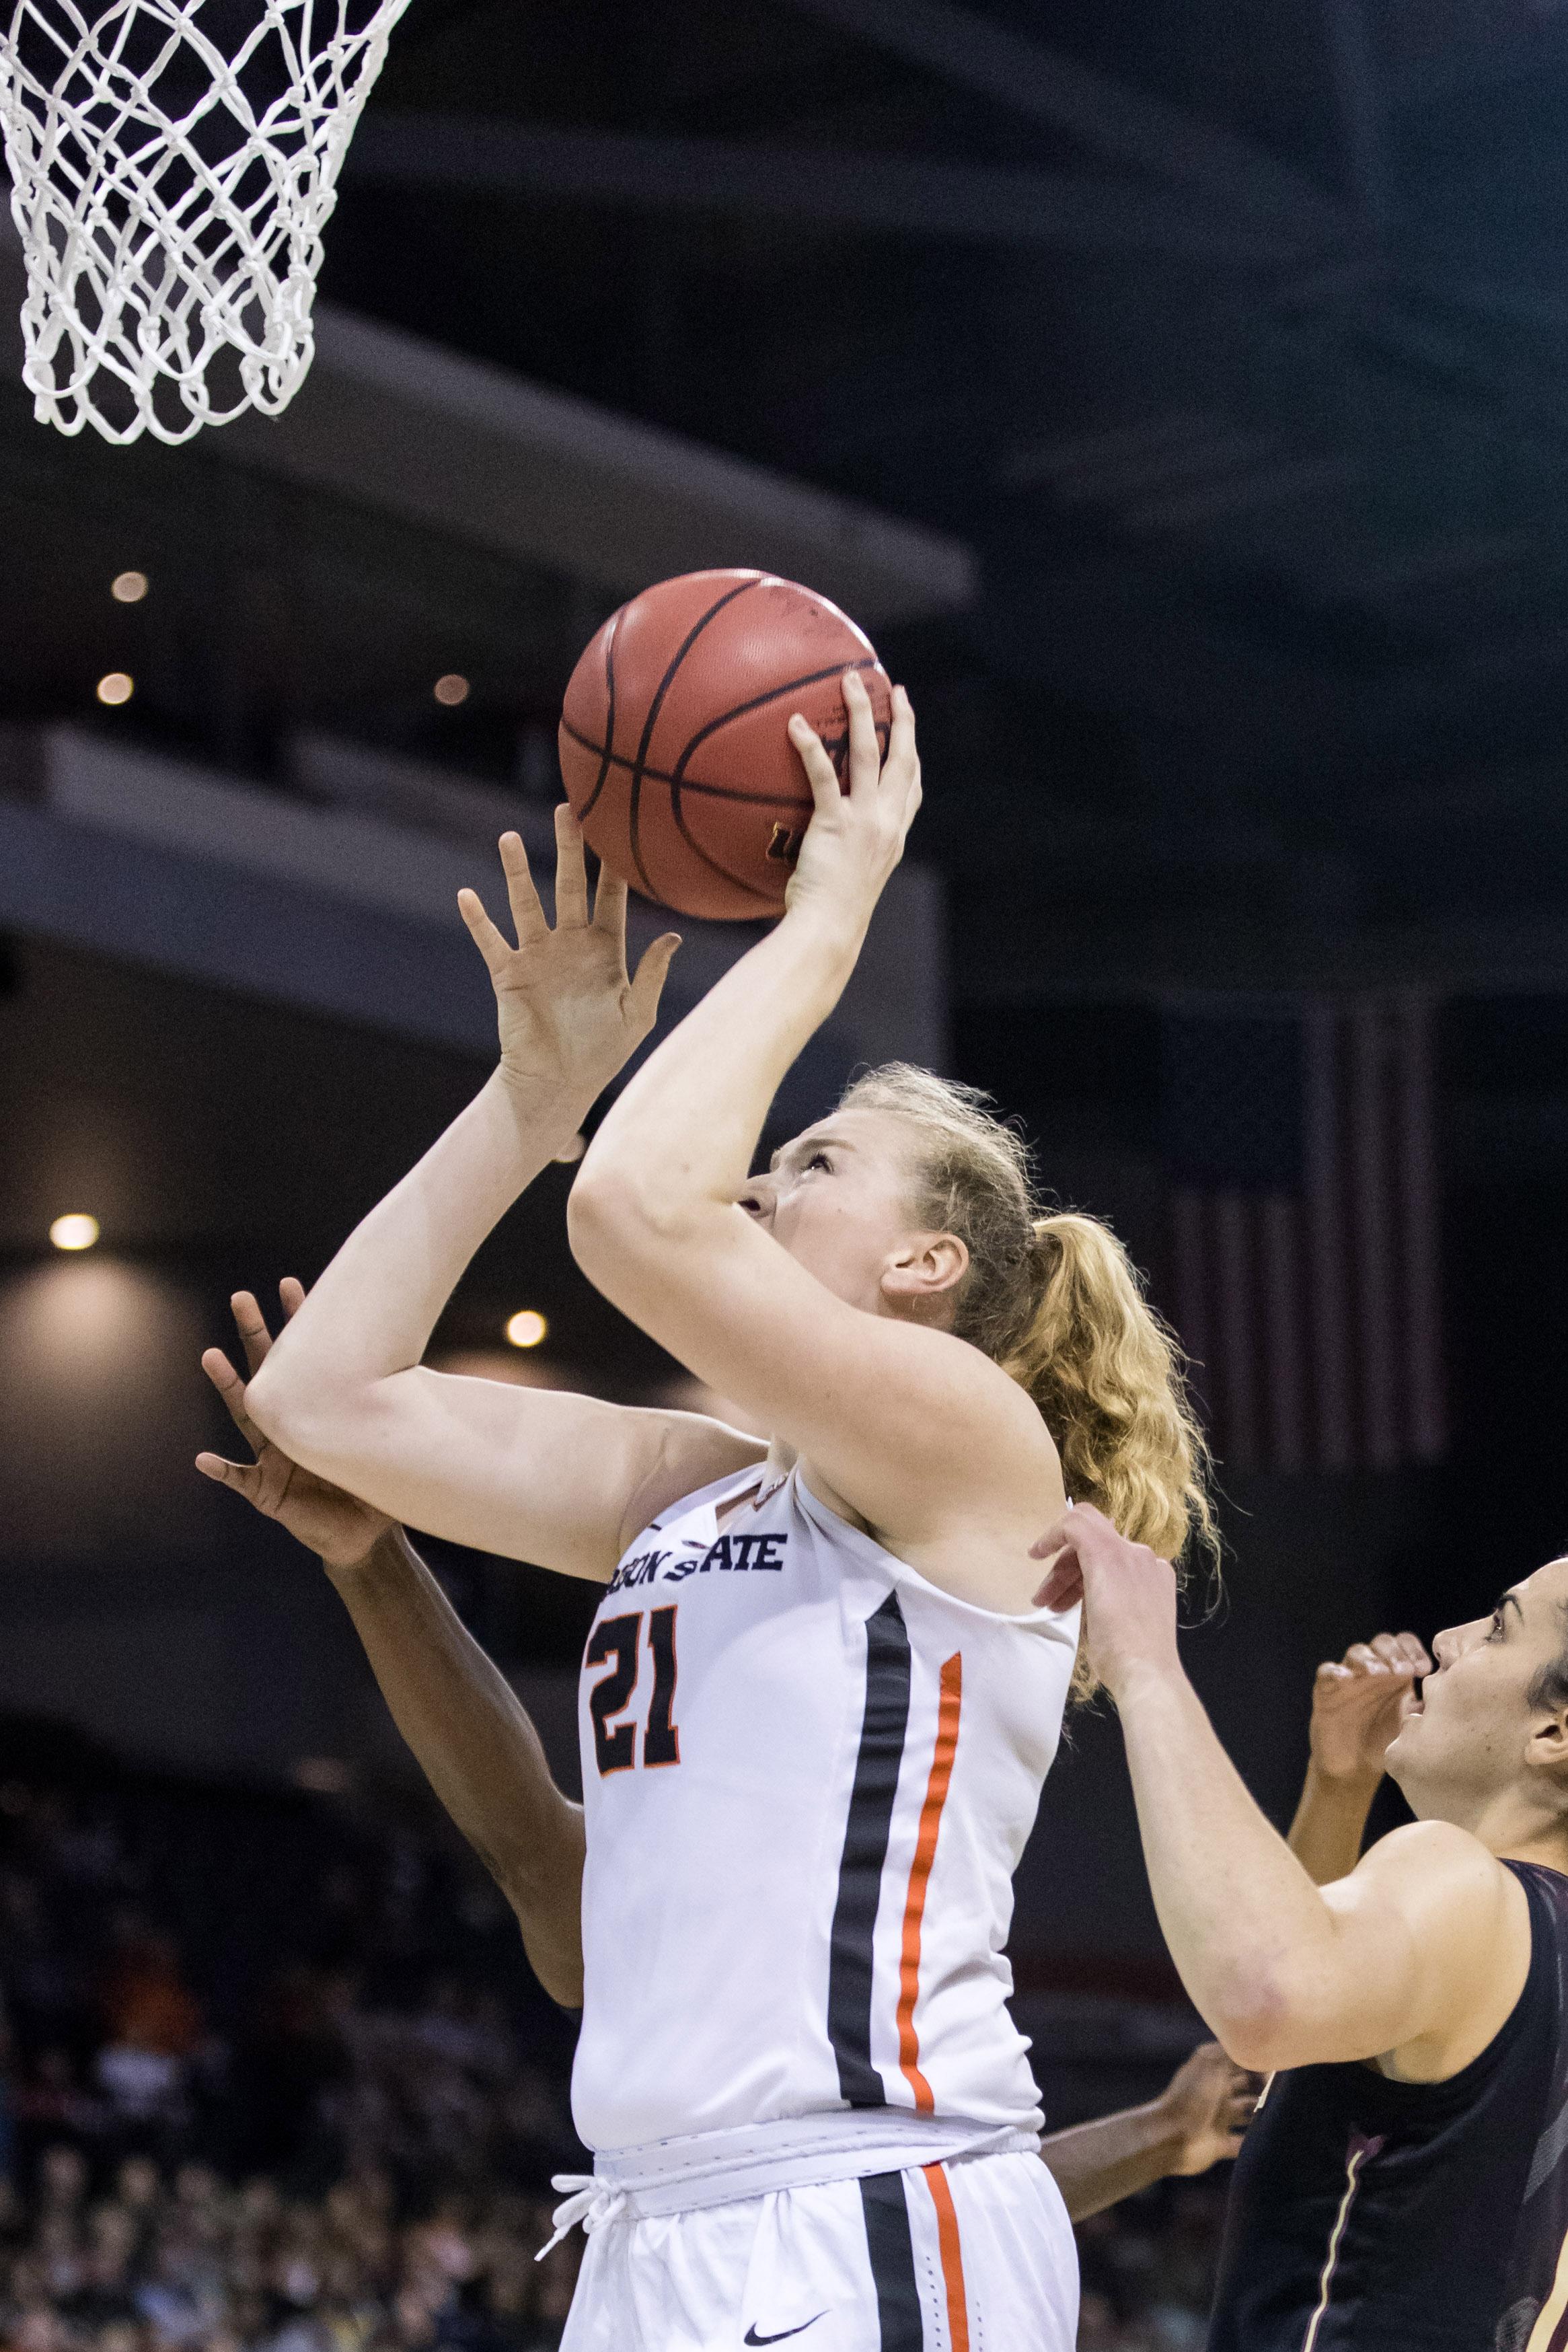 Preview: Oregon State Women's Basketball Season Opens Versus North Dakota